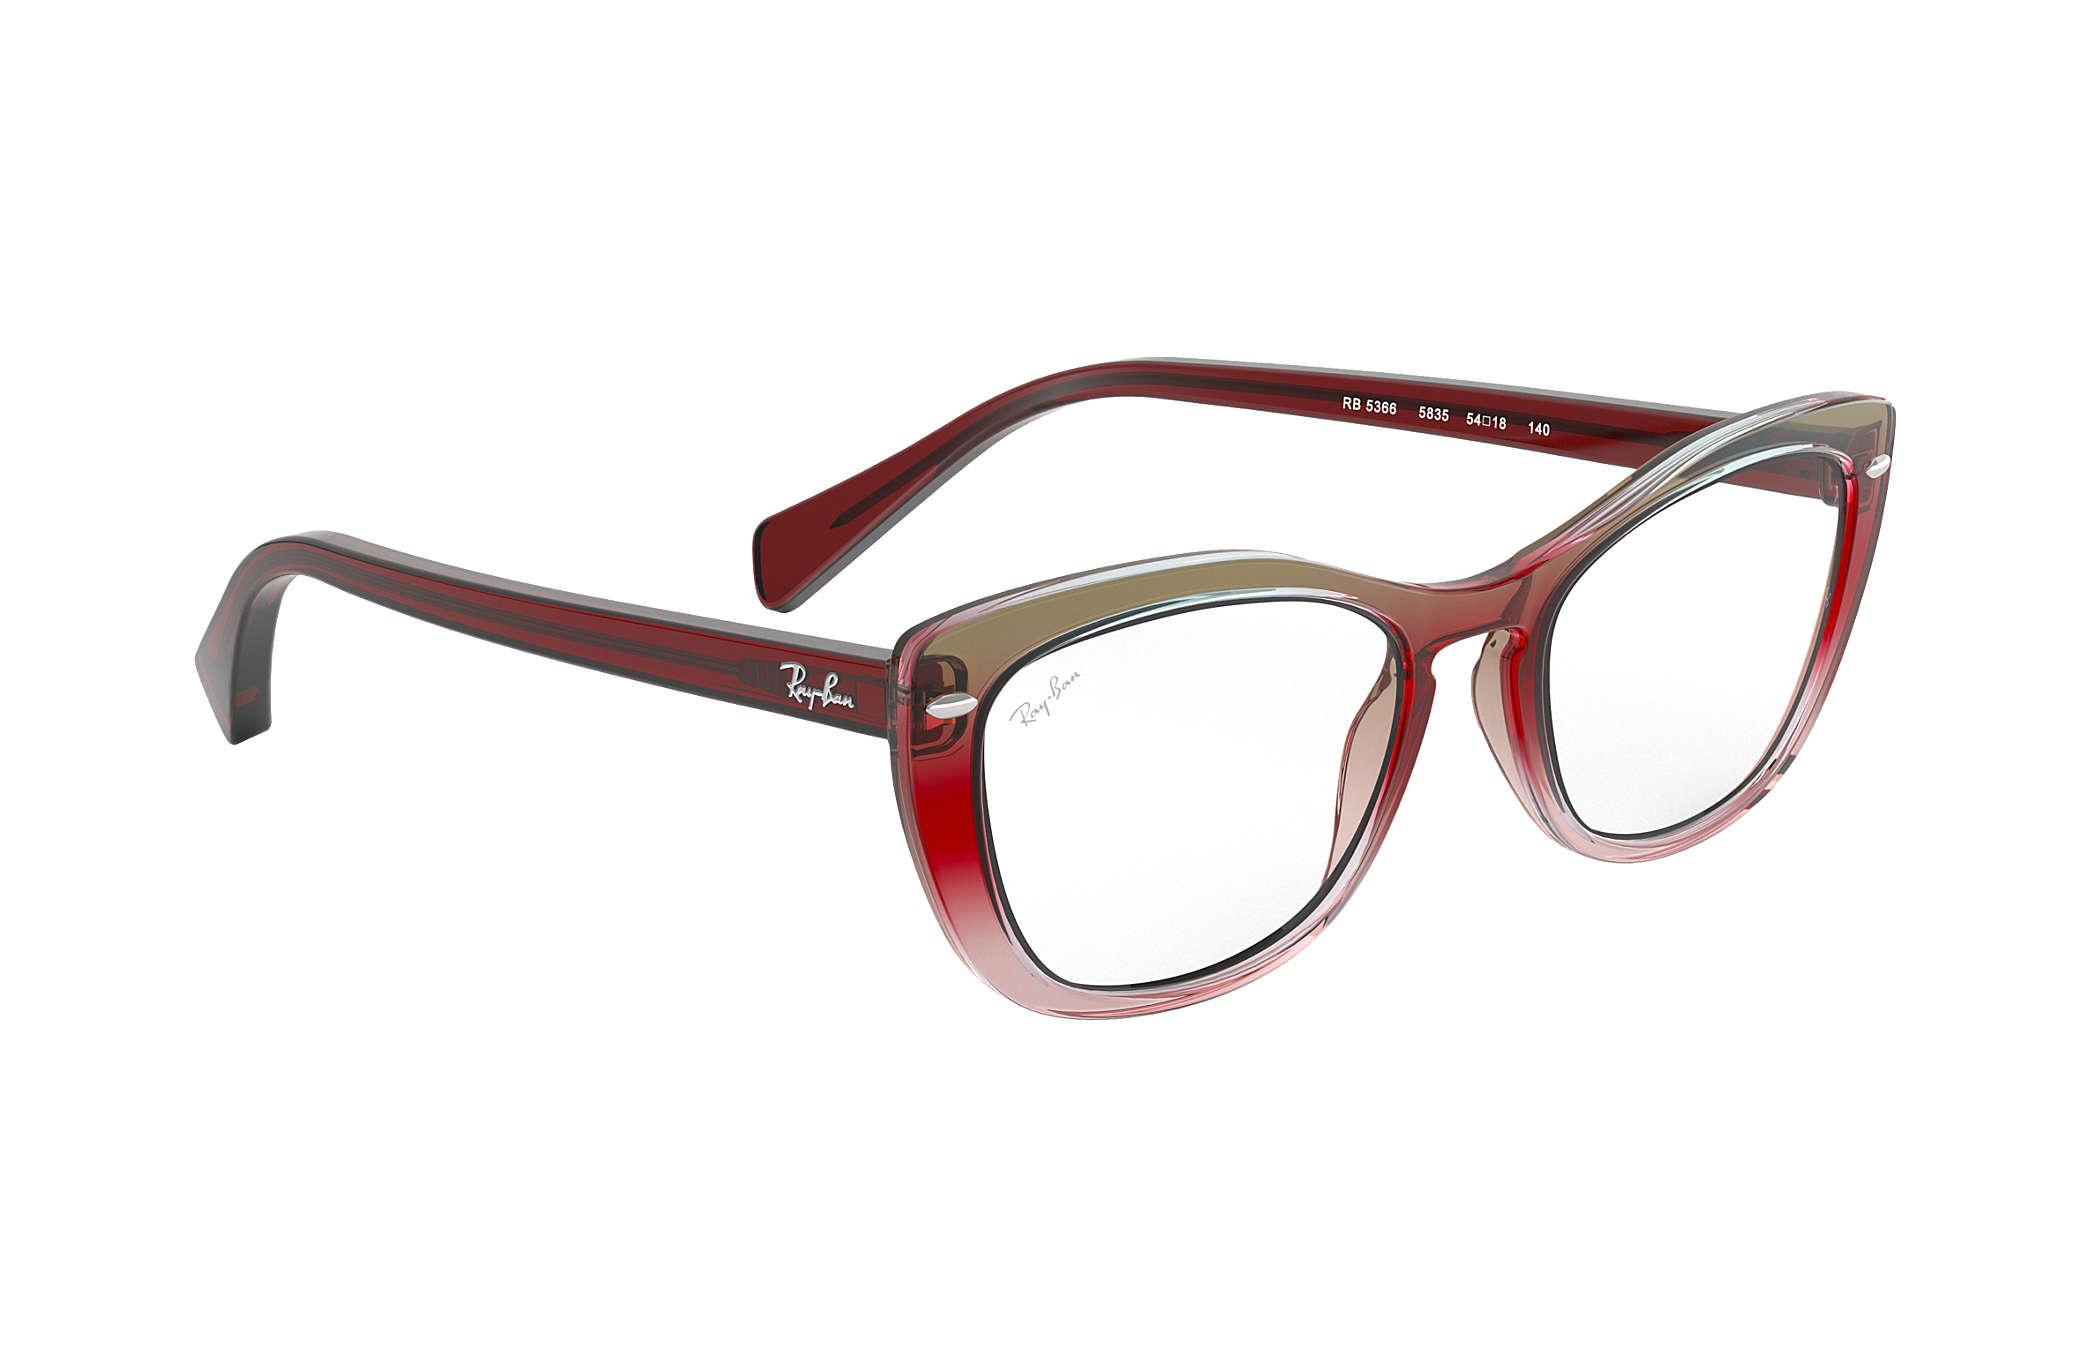 fa4332854f905 Ray-Ban prescription glasses RB5366 Trigradient Burgundy and Grey ...